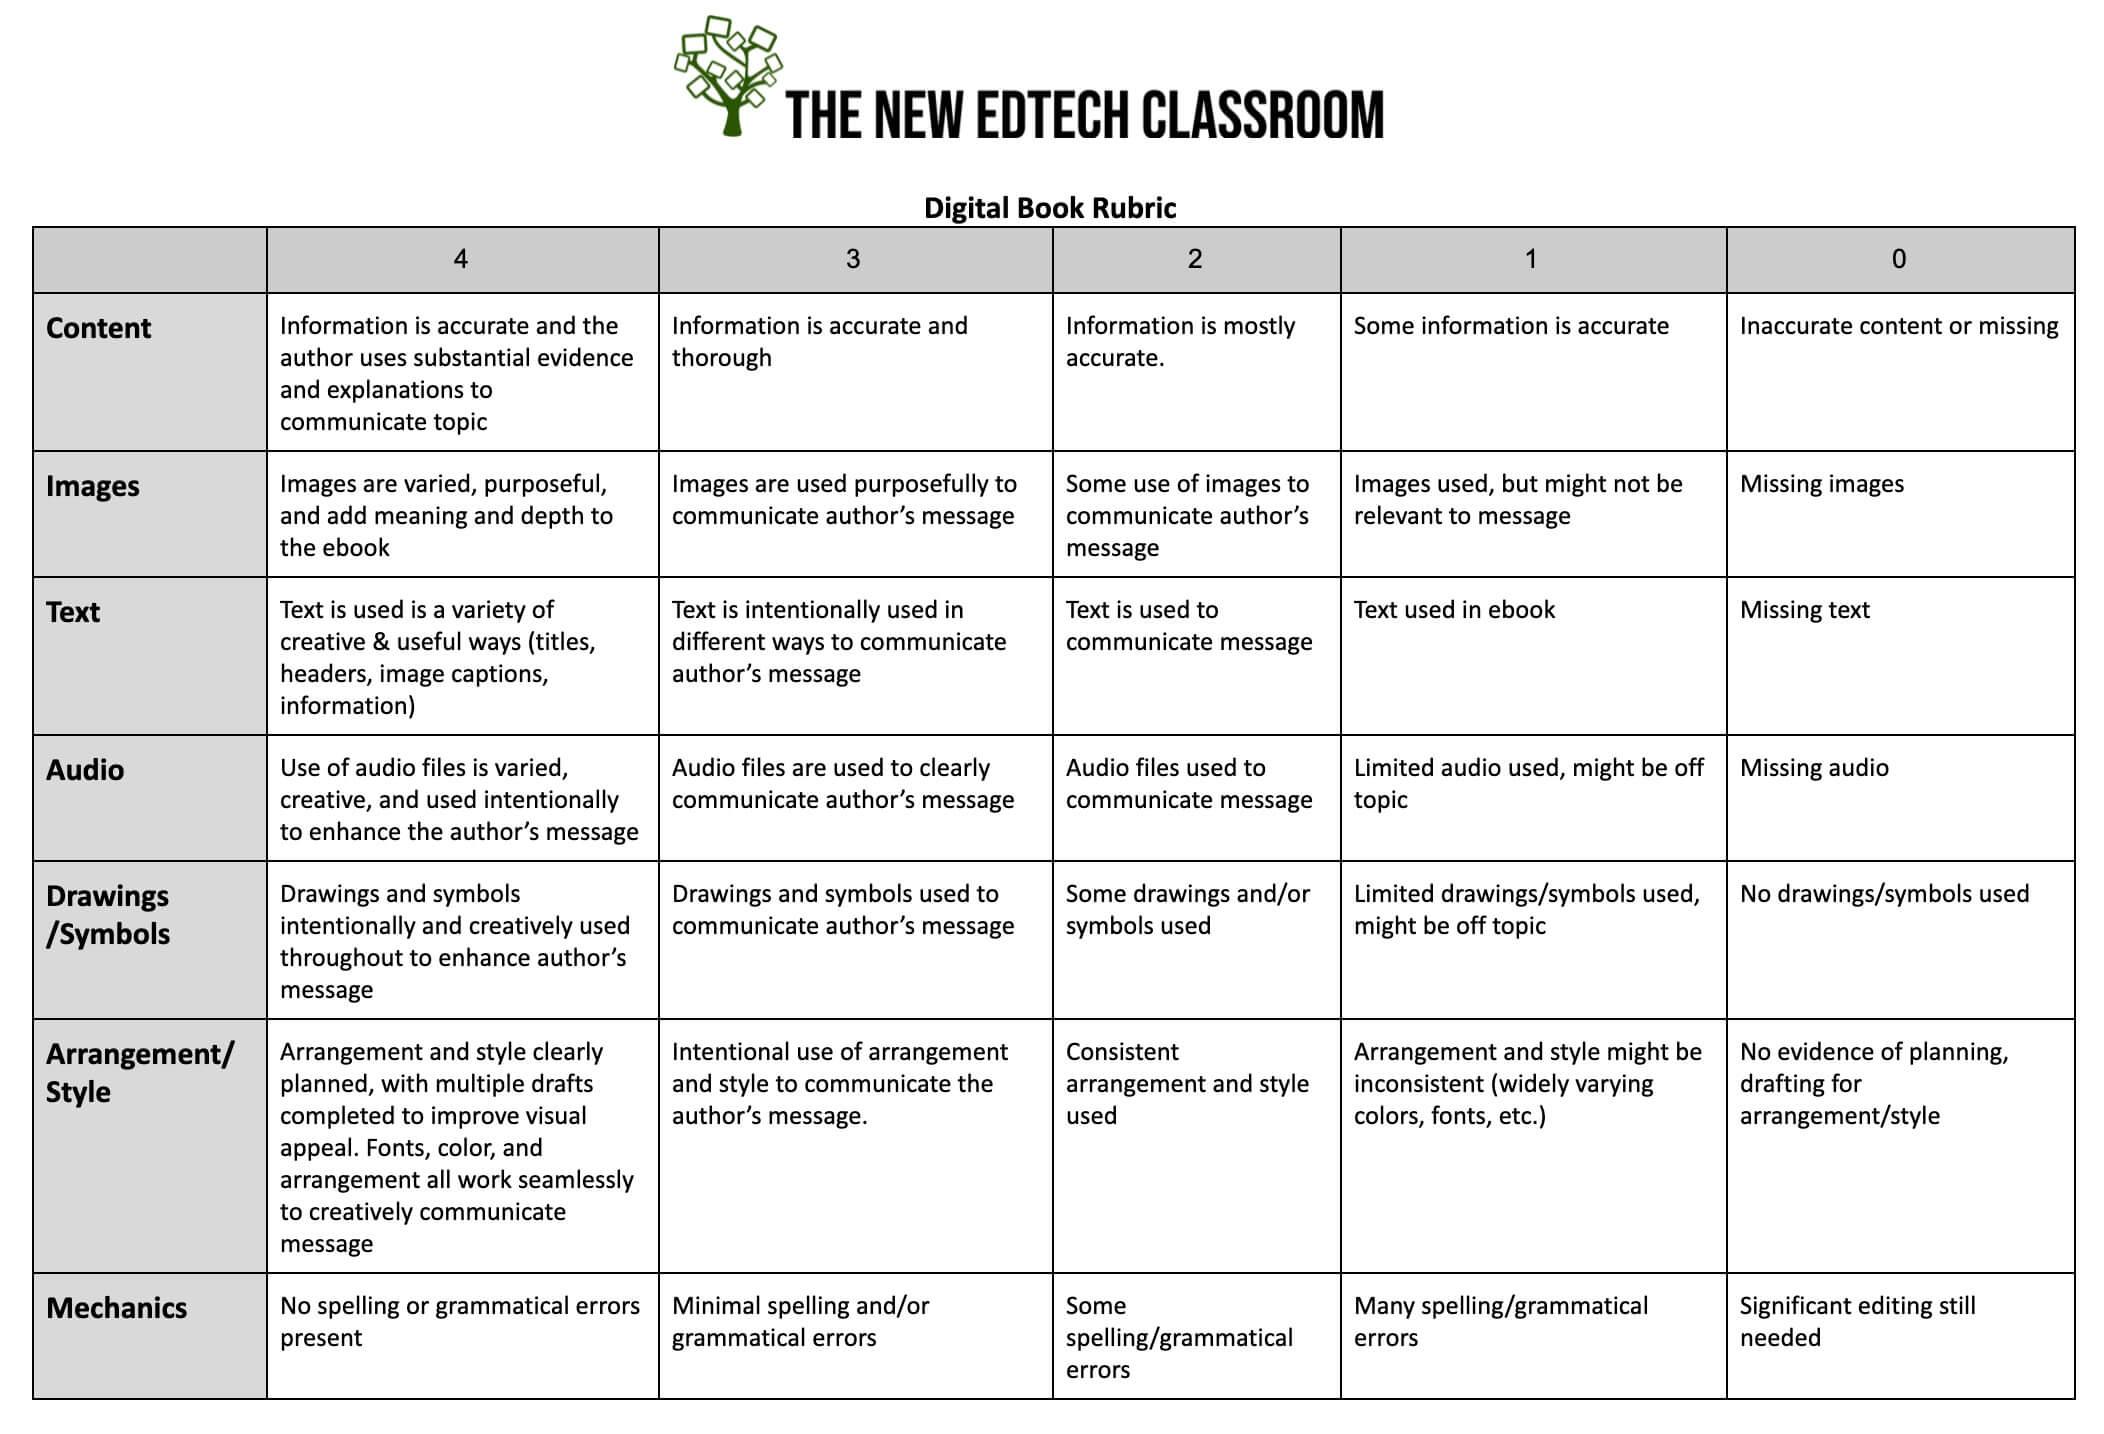 New EdTech Classroom Digital Book Rubric